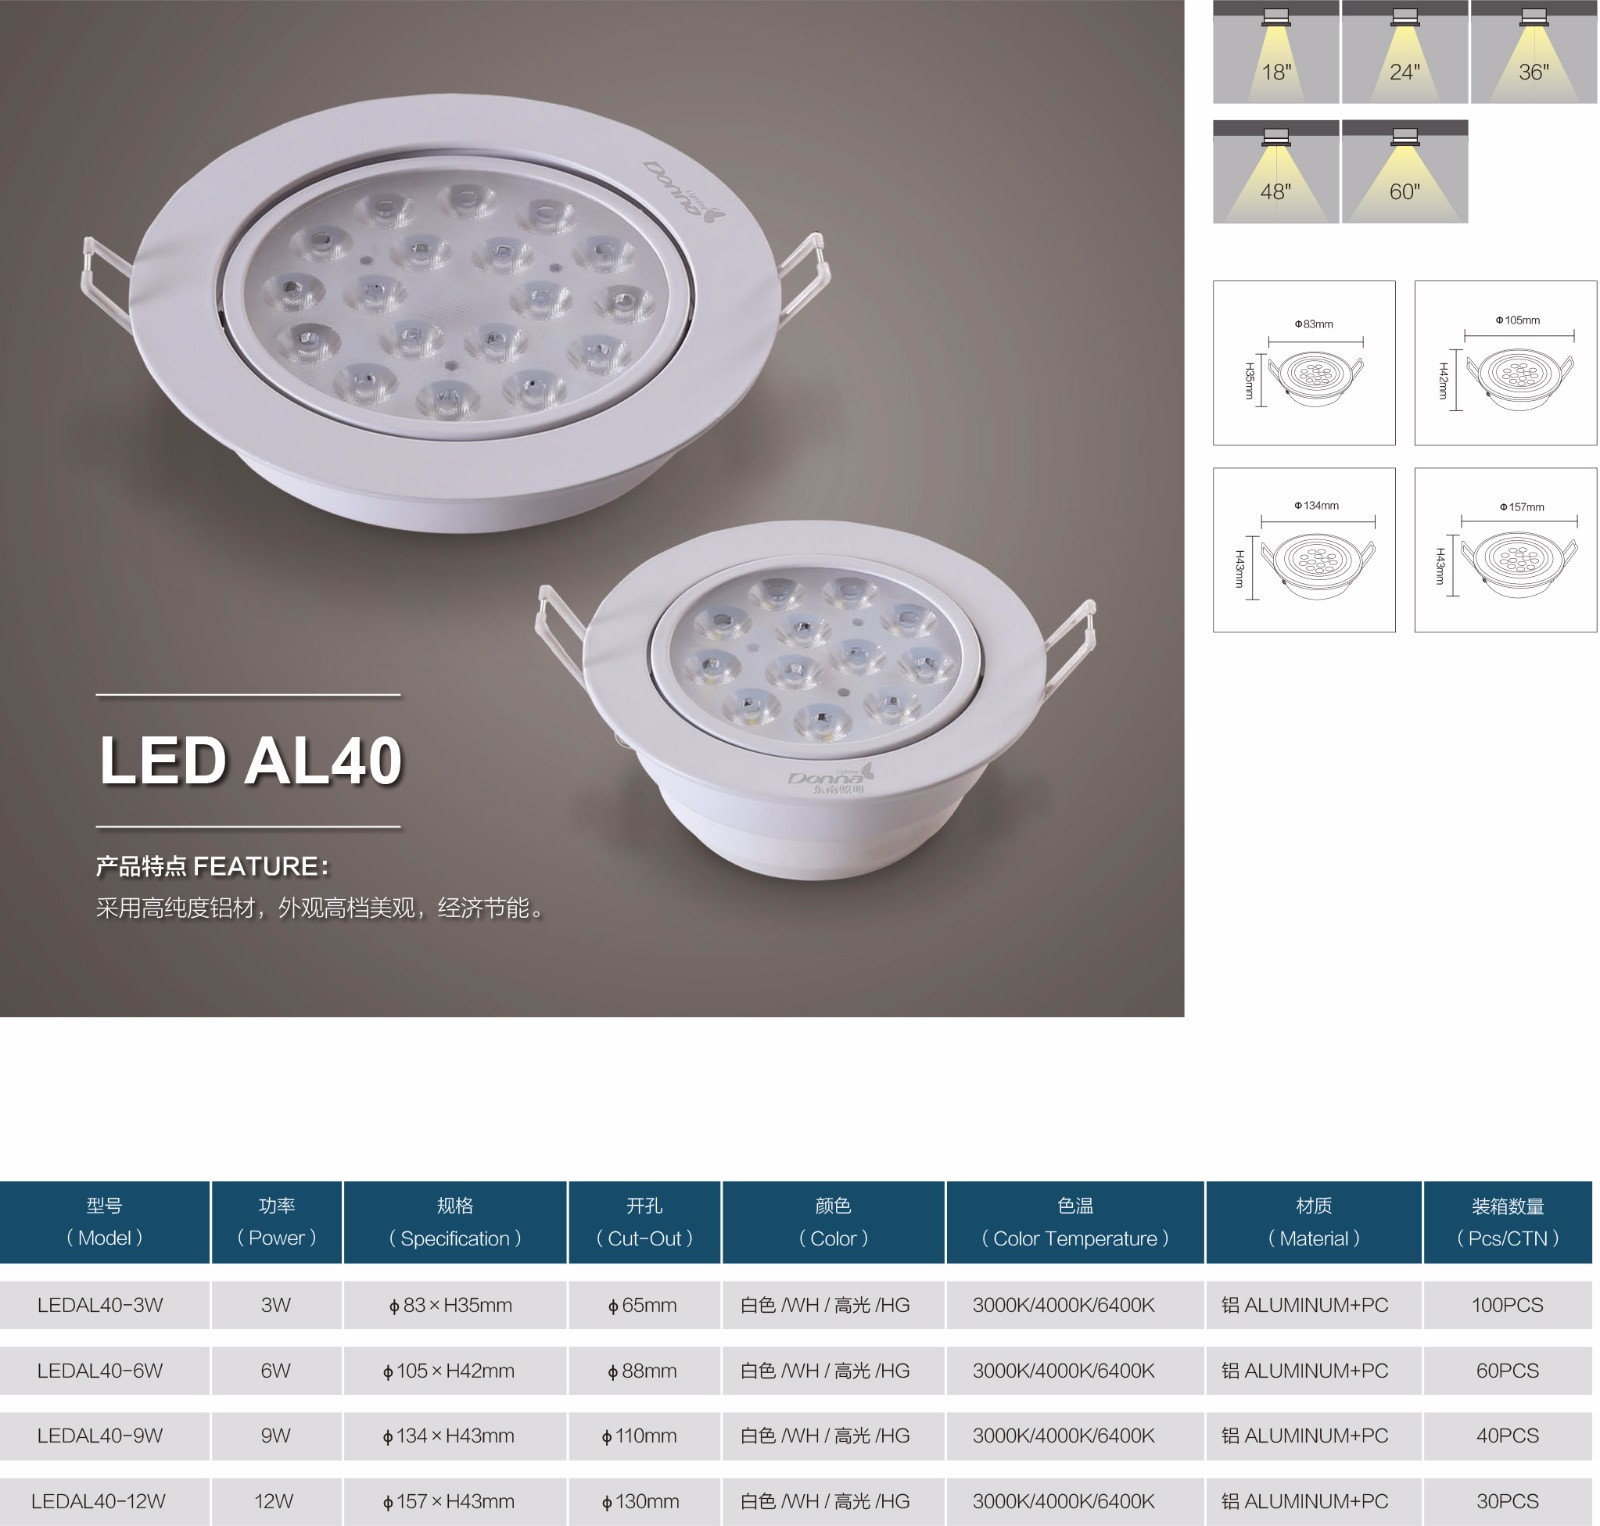 LED AL40|天花射灯-佛山市南海区东南灯饰照明有限公司